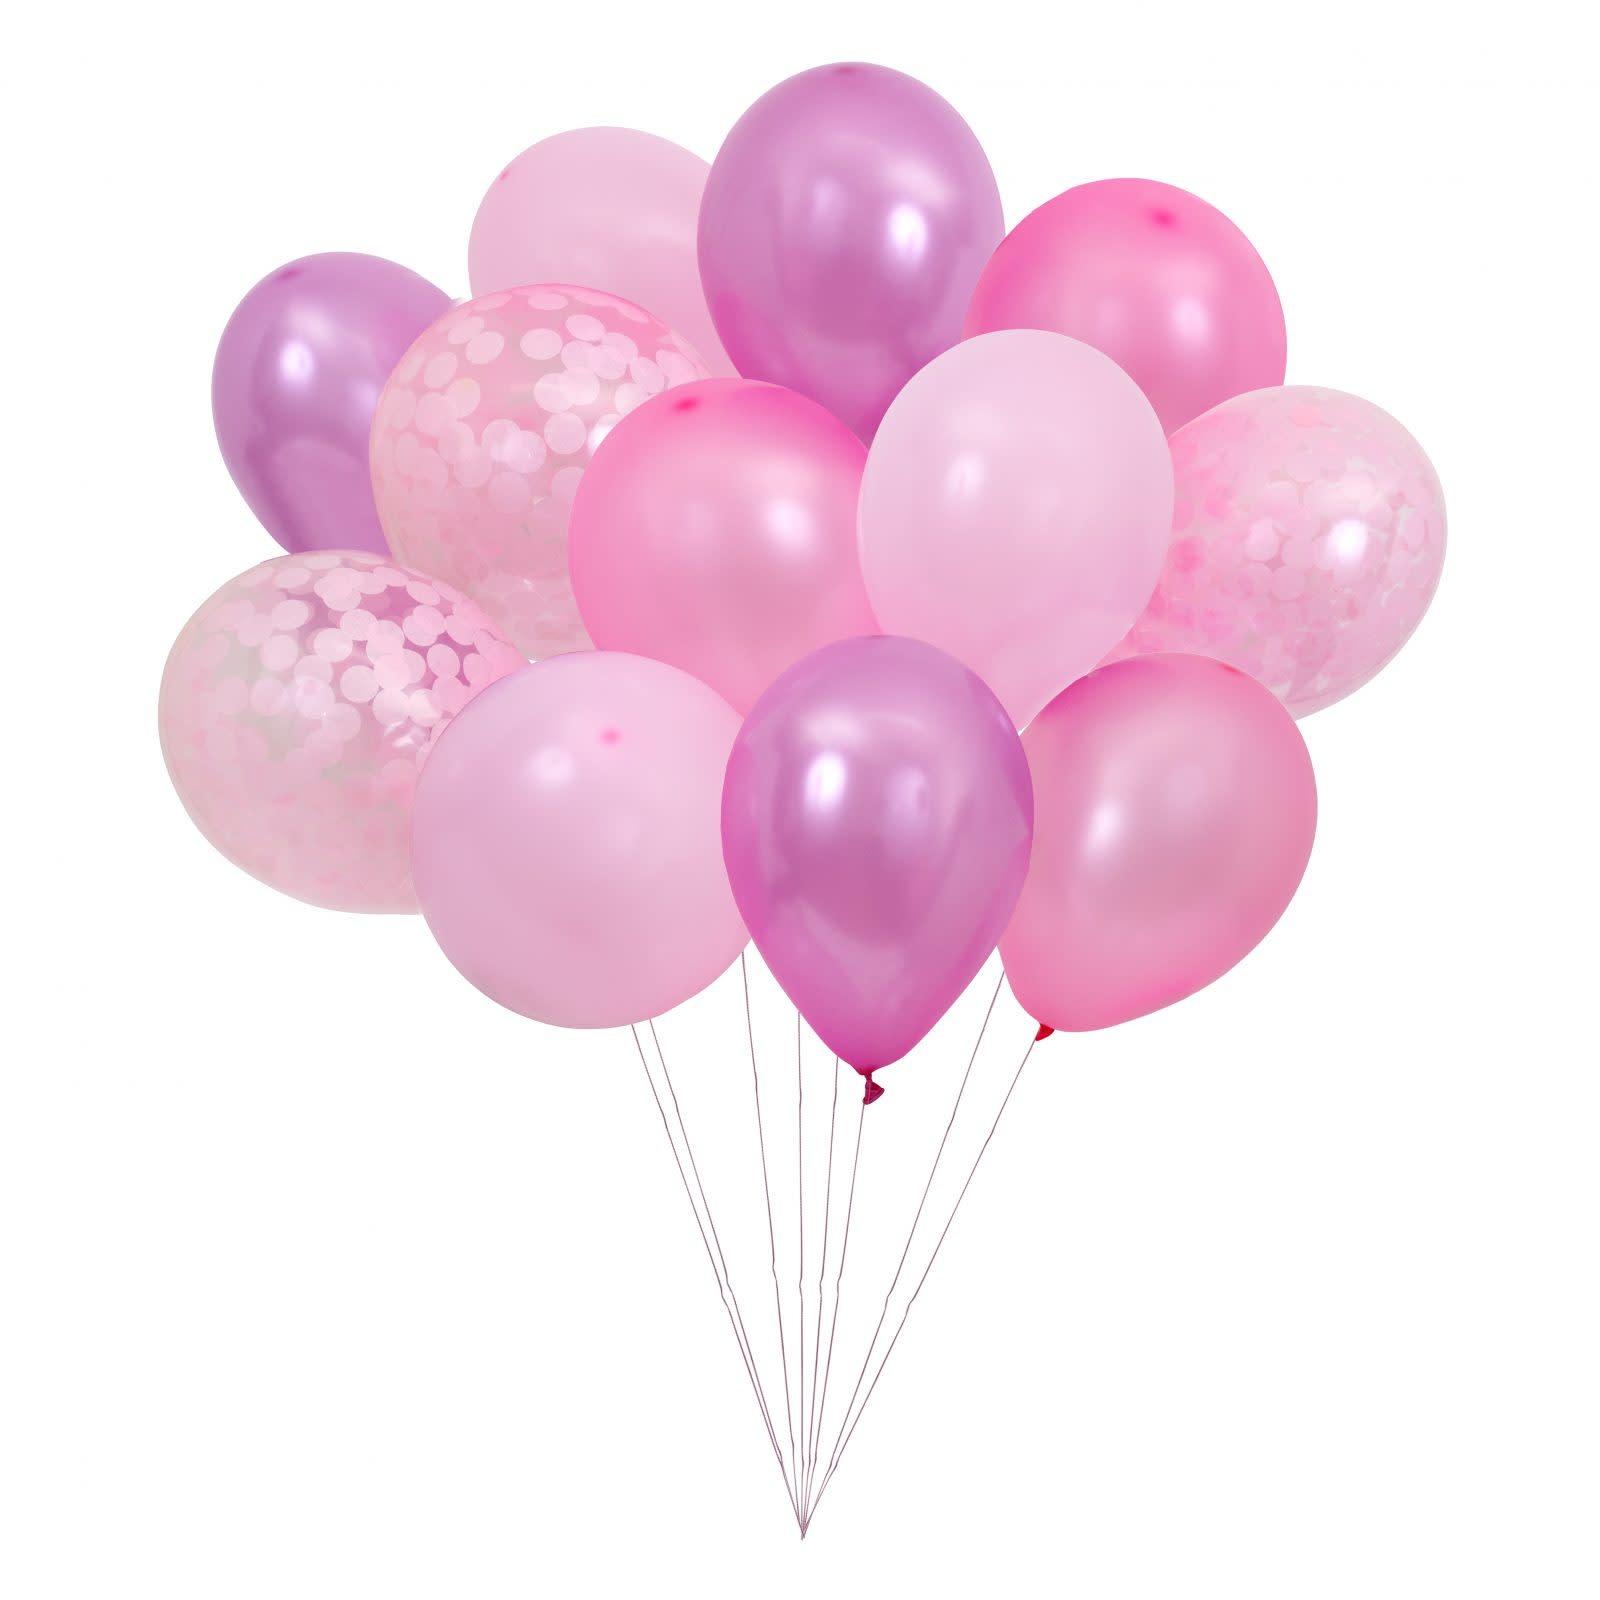 MERIMERI Beautiful balloons pink